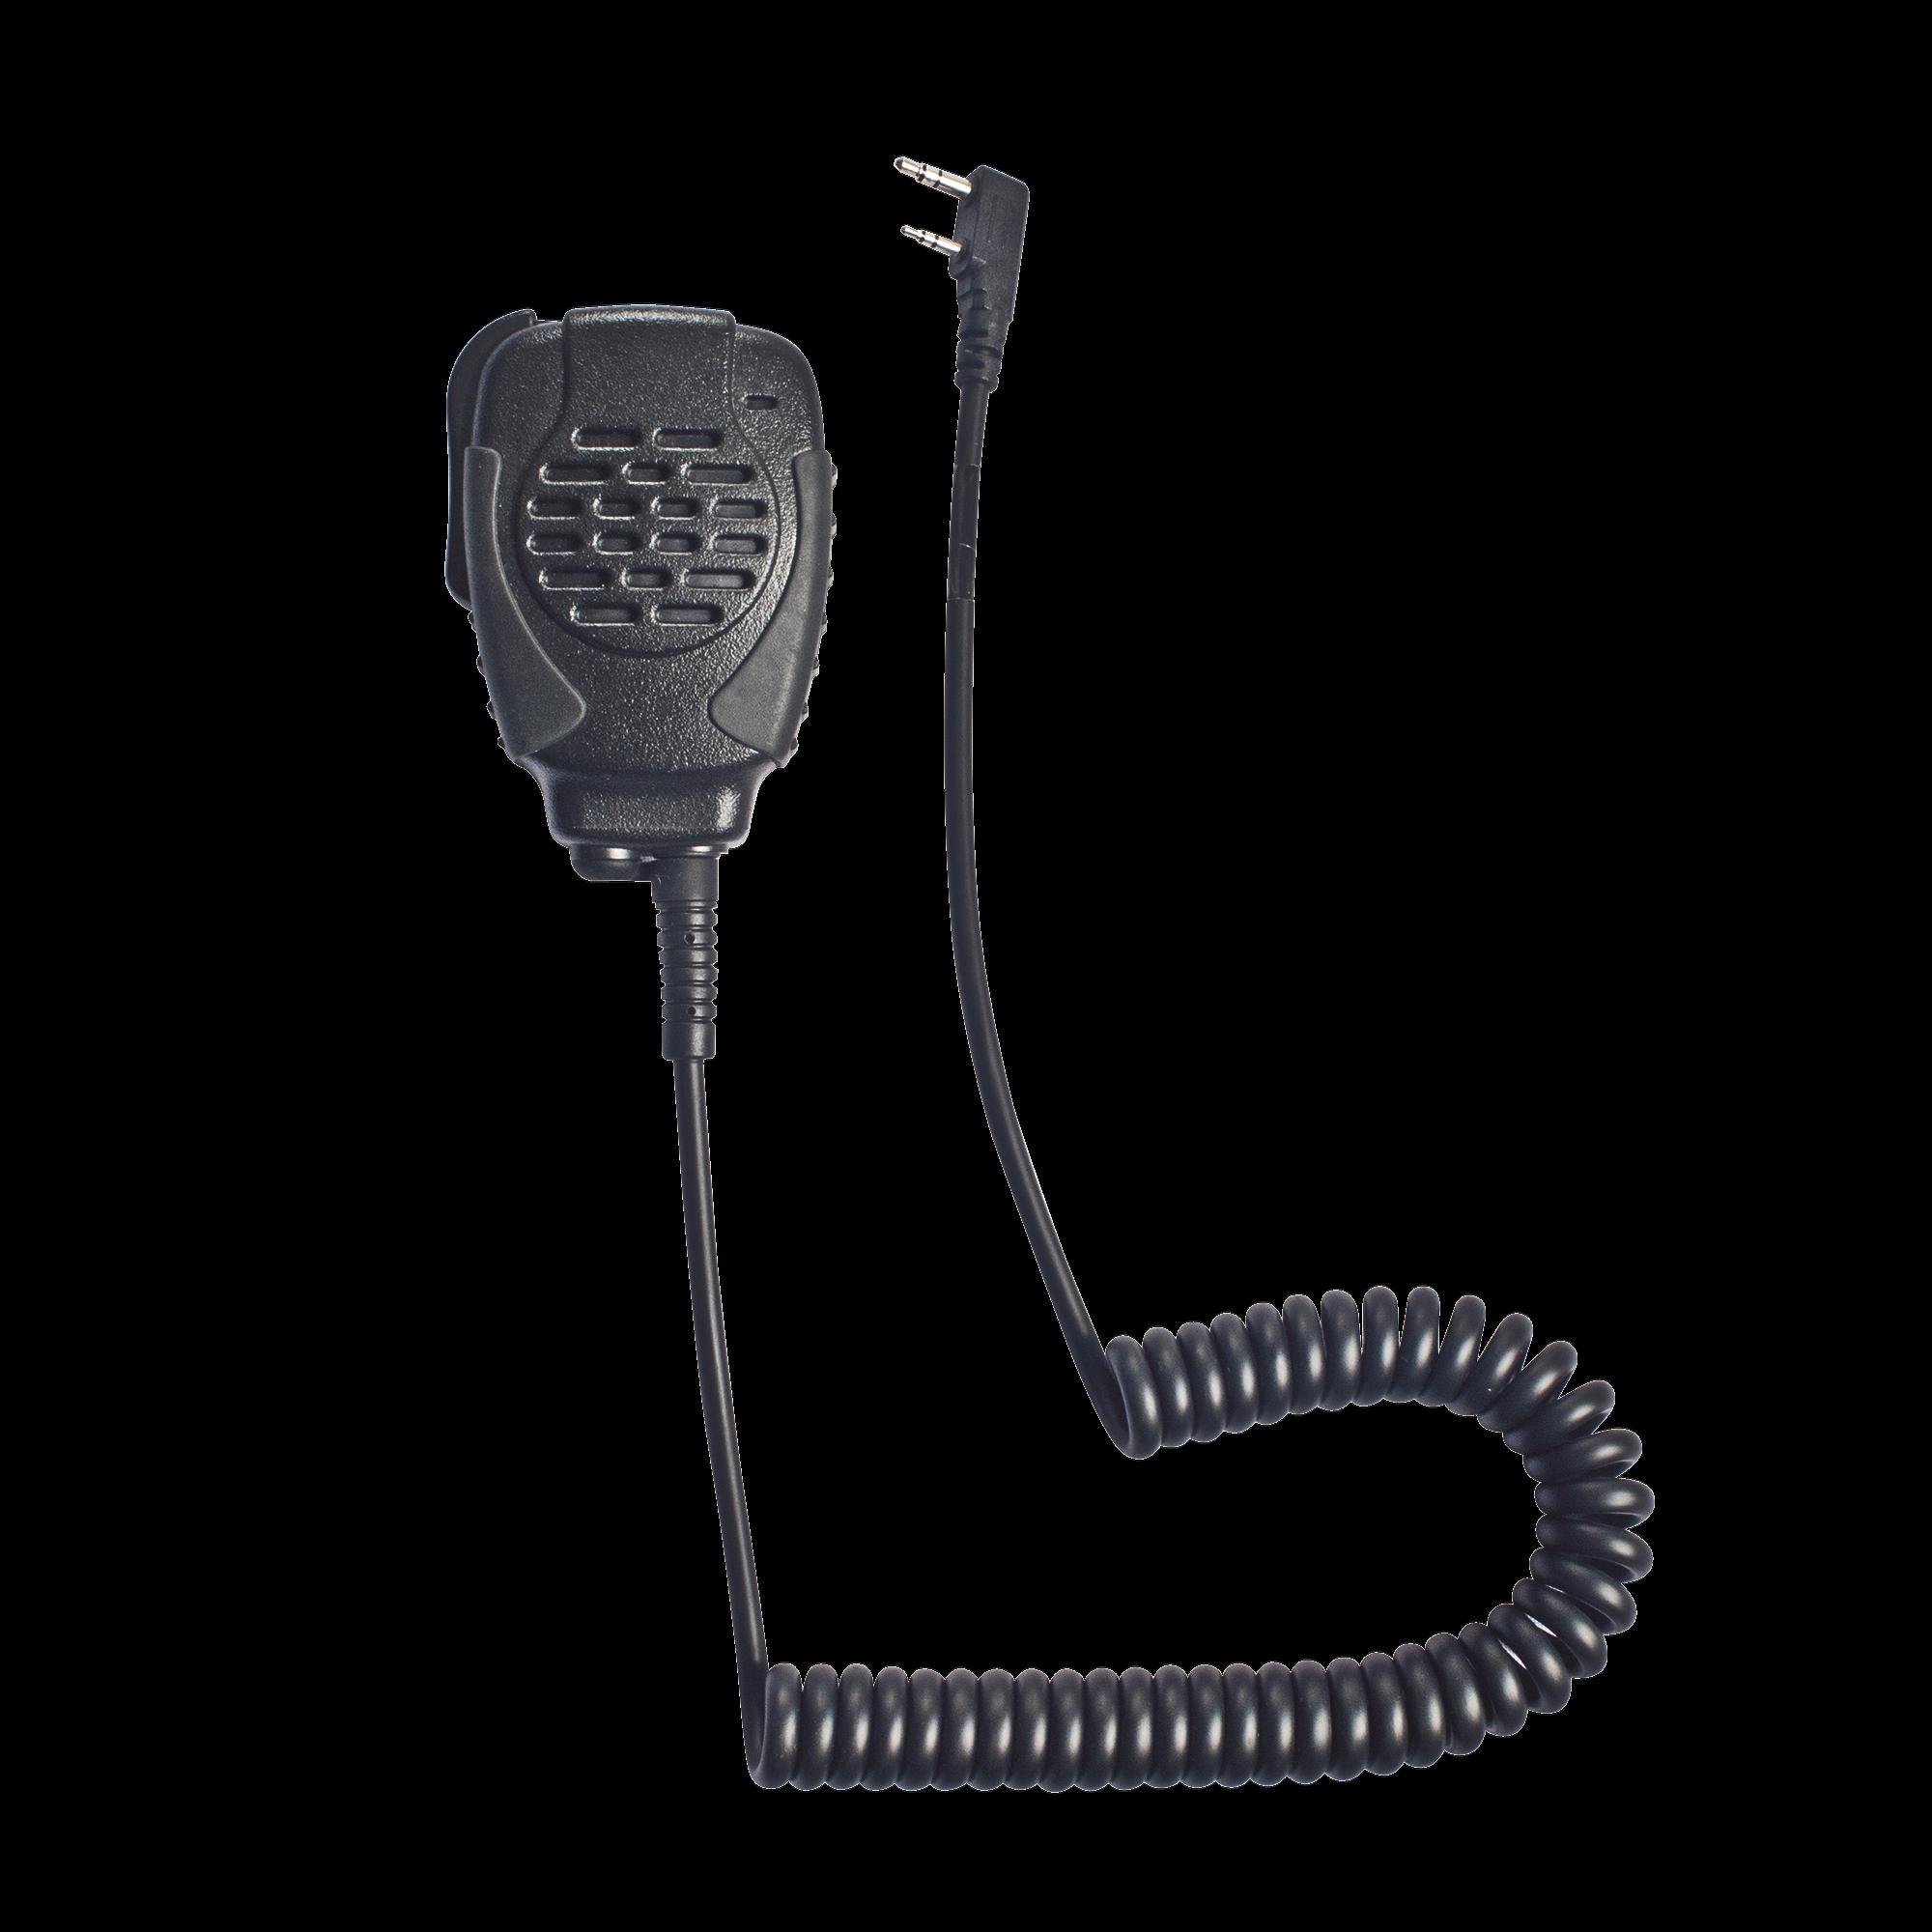 Micrófono-bocina con GPS para radios KENWOOD NX-1000/240/340/220/320, TK-2312/3312/2360/3360